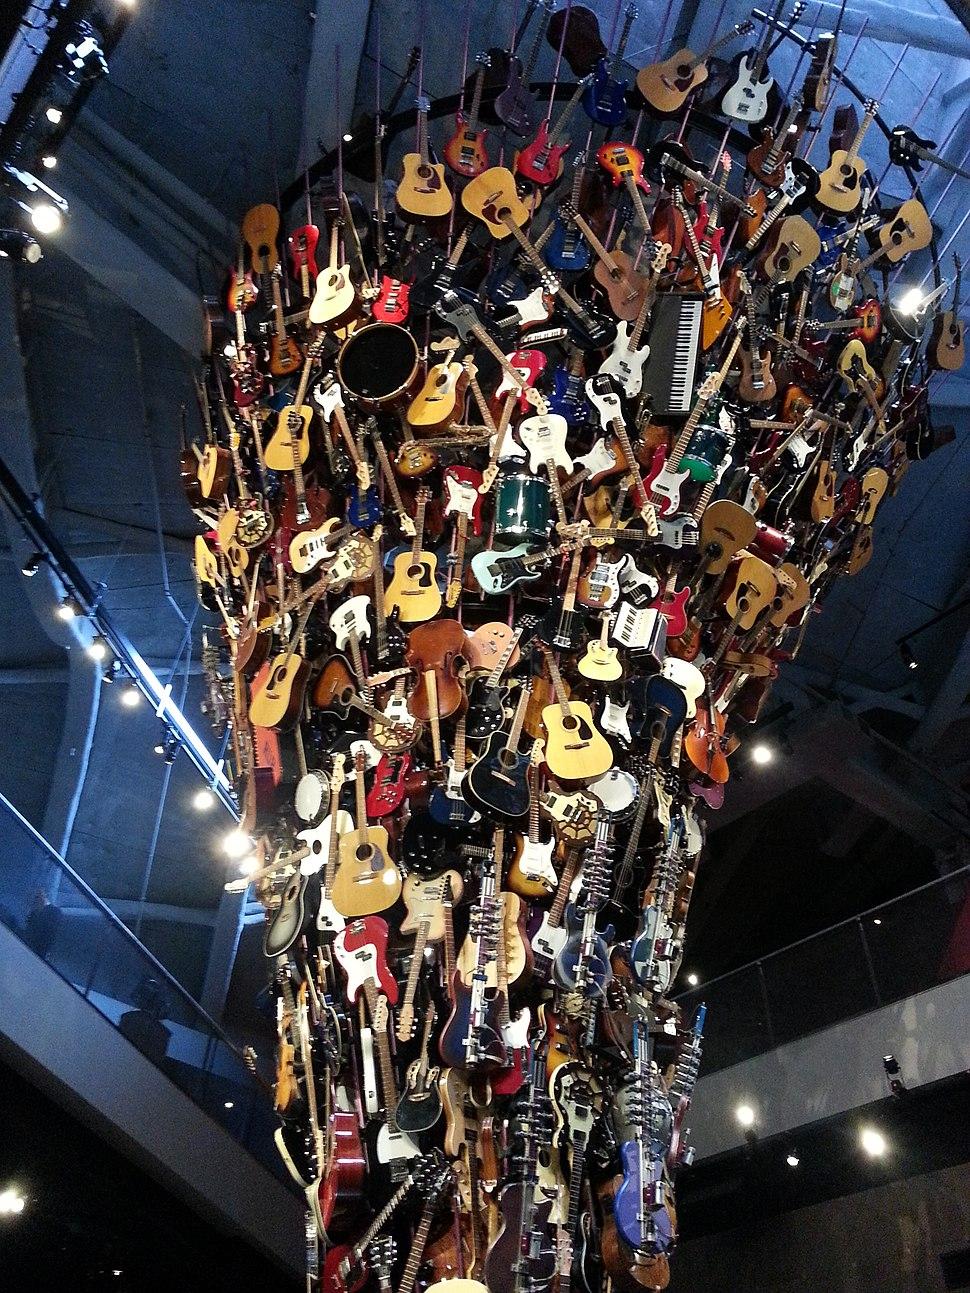 Guitar Art at the EMP